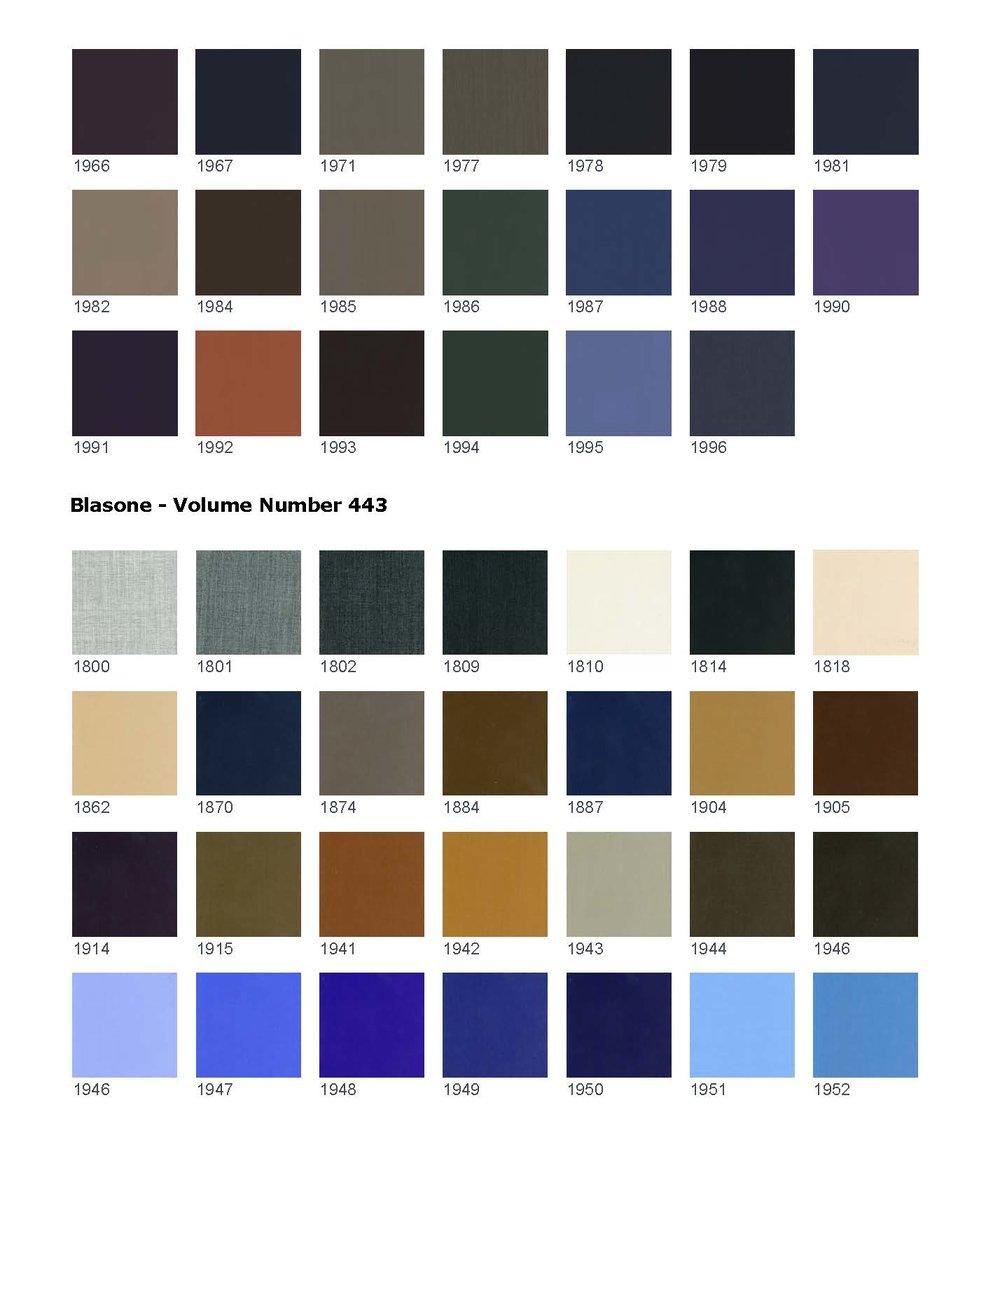 Blasone Fabric collection _Page_2.jpg